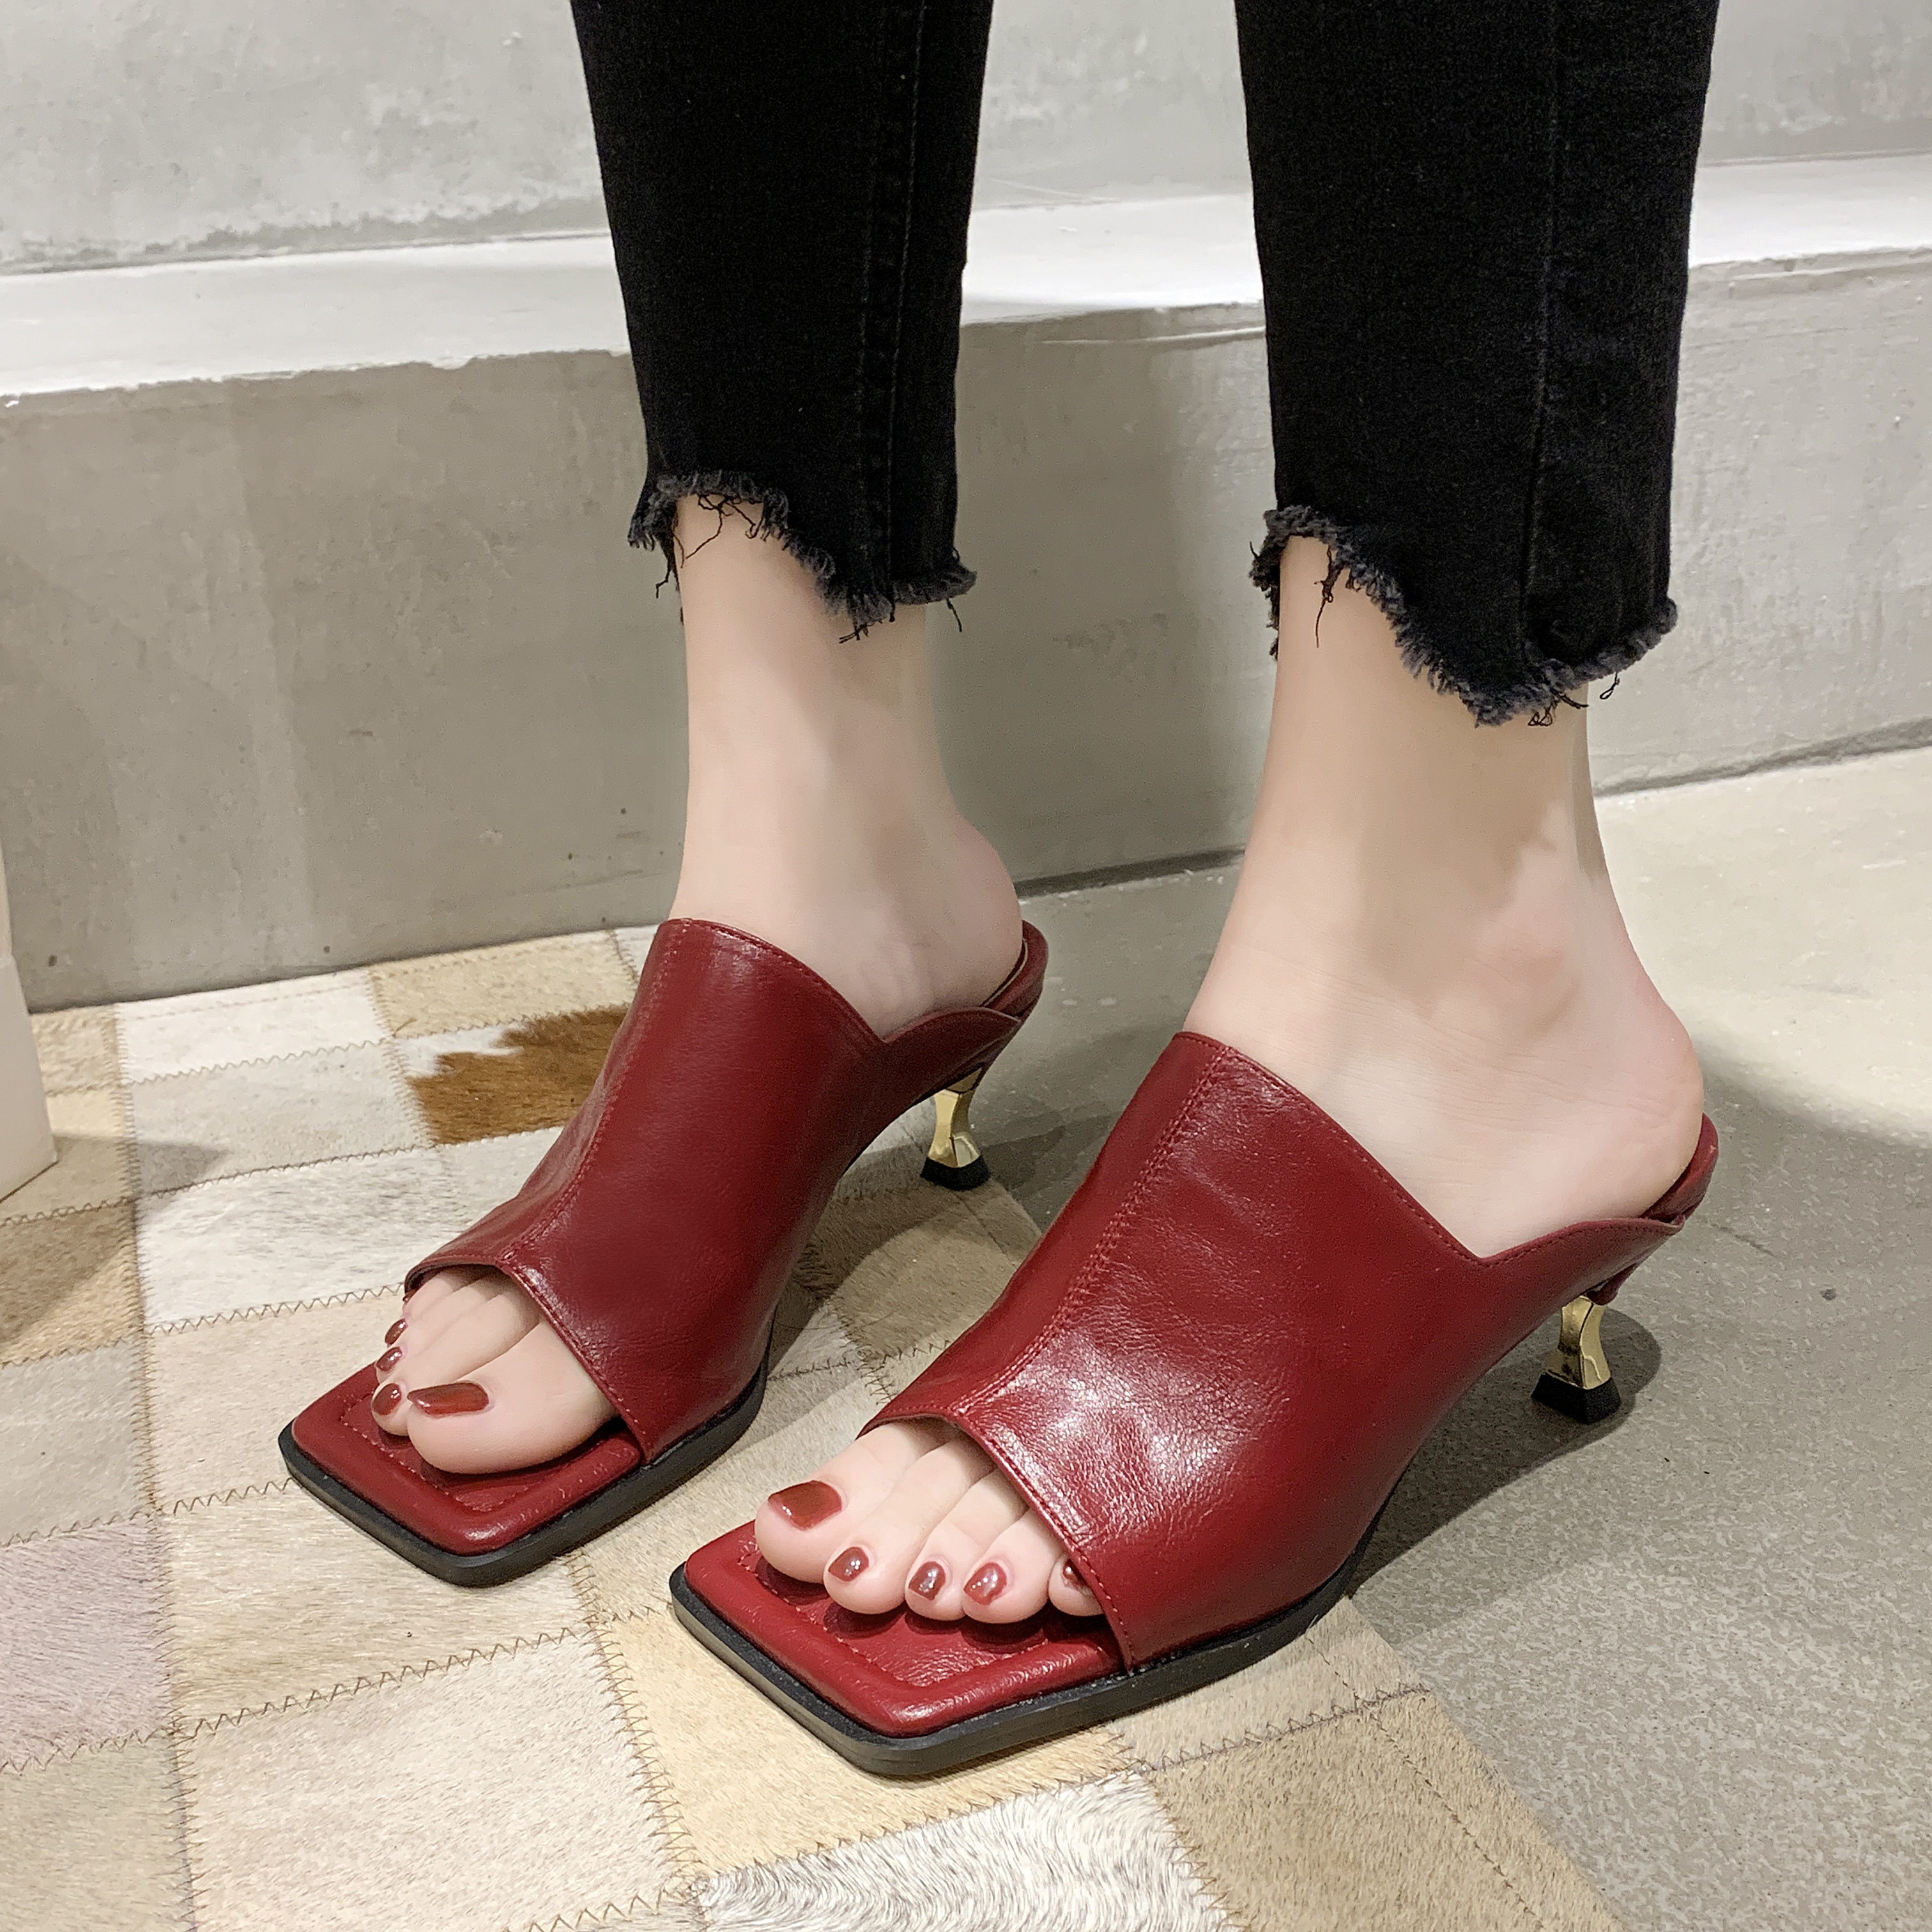 Hot Clip-auf Karree High Heels Sandalen Frauen Sexy Party Hausschuhe Frauen Flip-Flops Schuhe Frau Zapatos De mujer